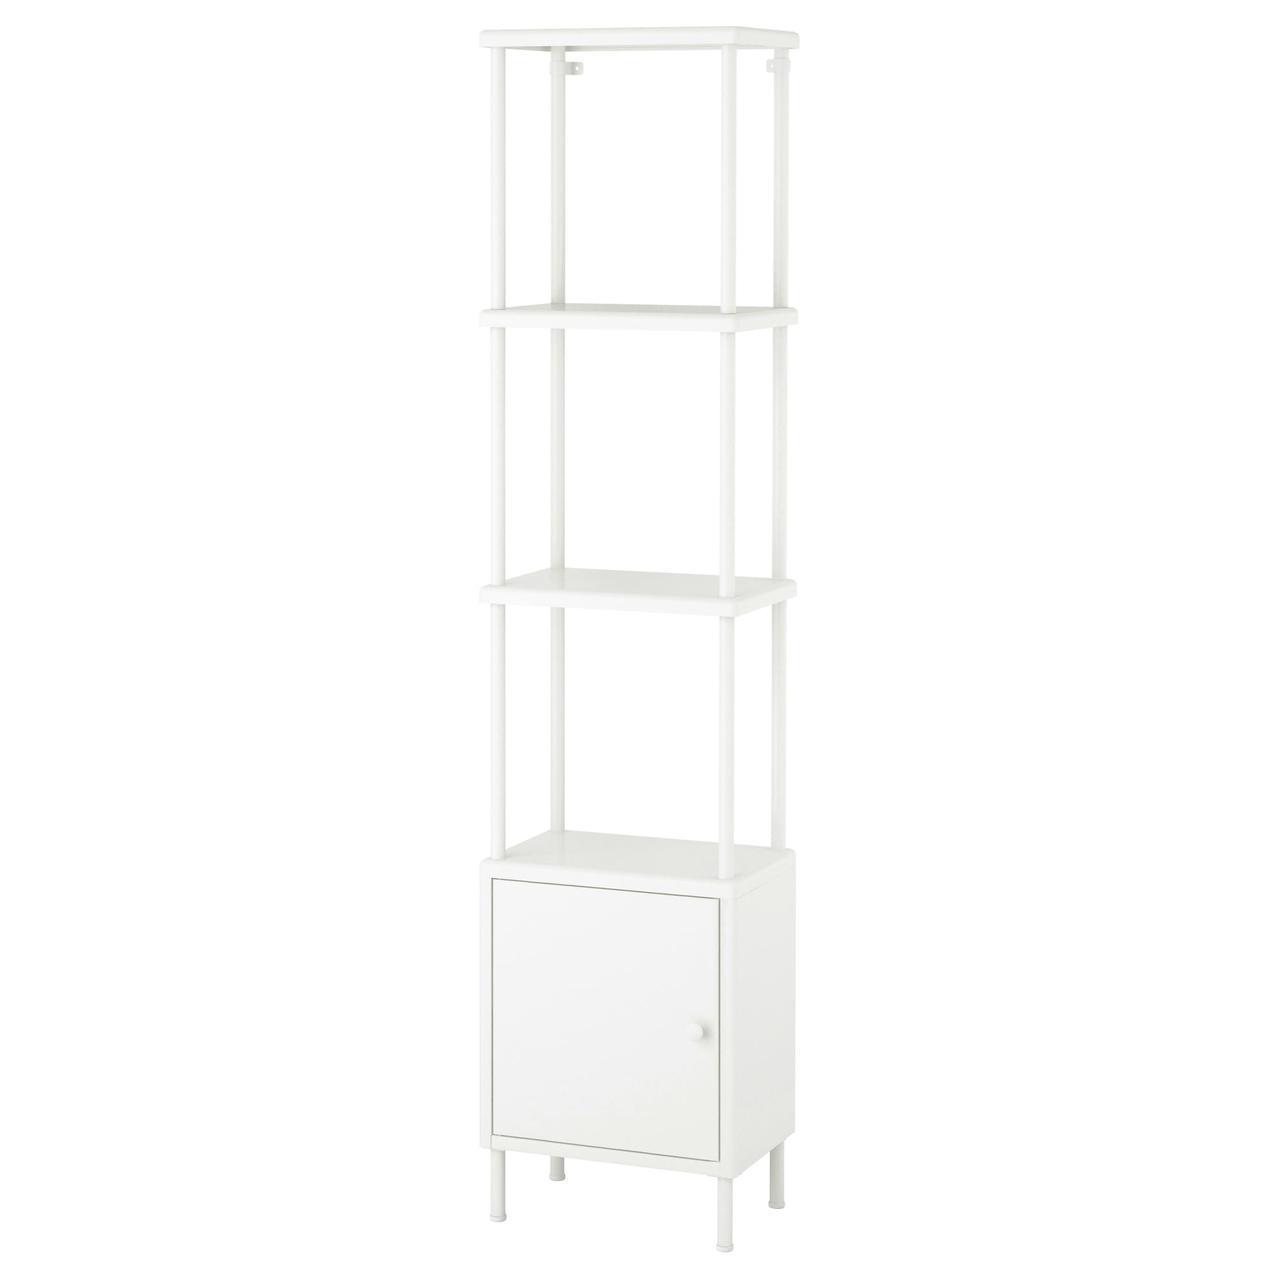 IKEA DYNAN (691.833.99) Шкаф из шкафа, белый